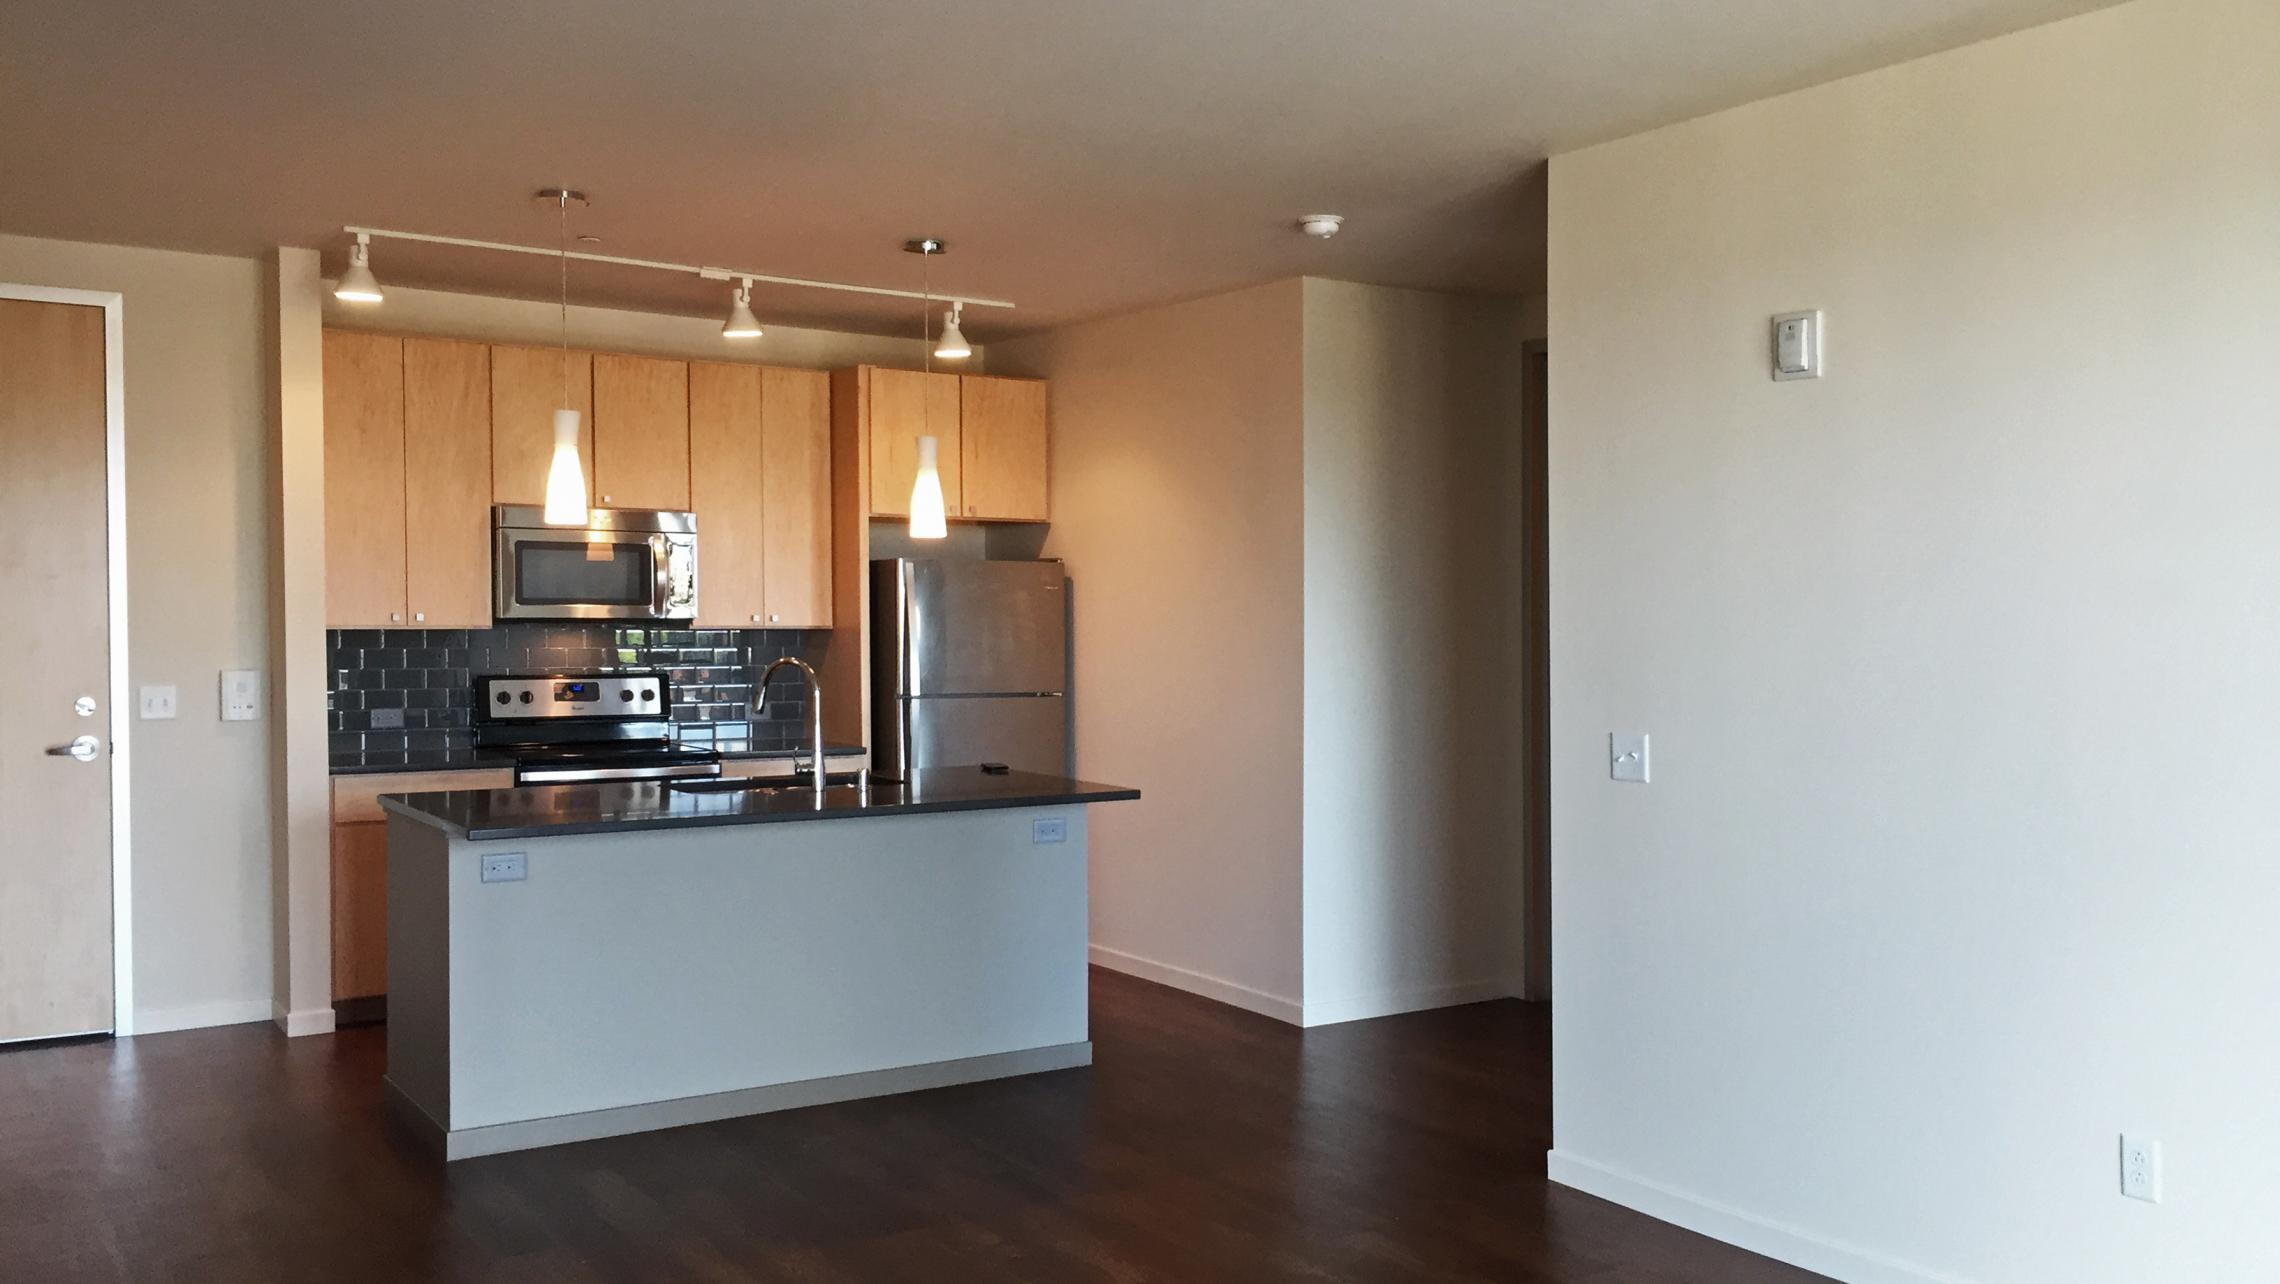 ULI Nine Line Apartment 219 - Kitchen and Living Area